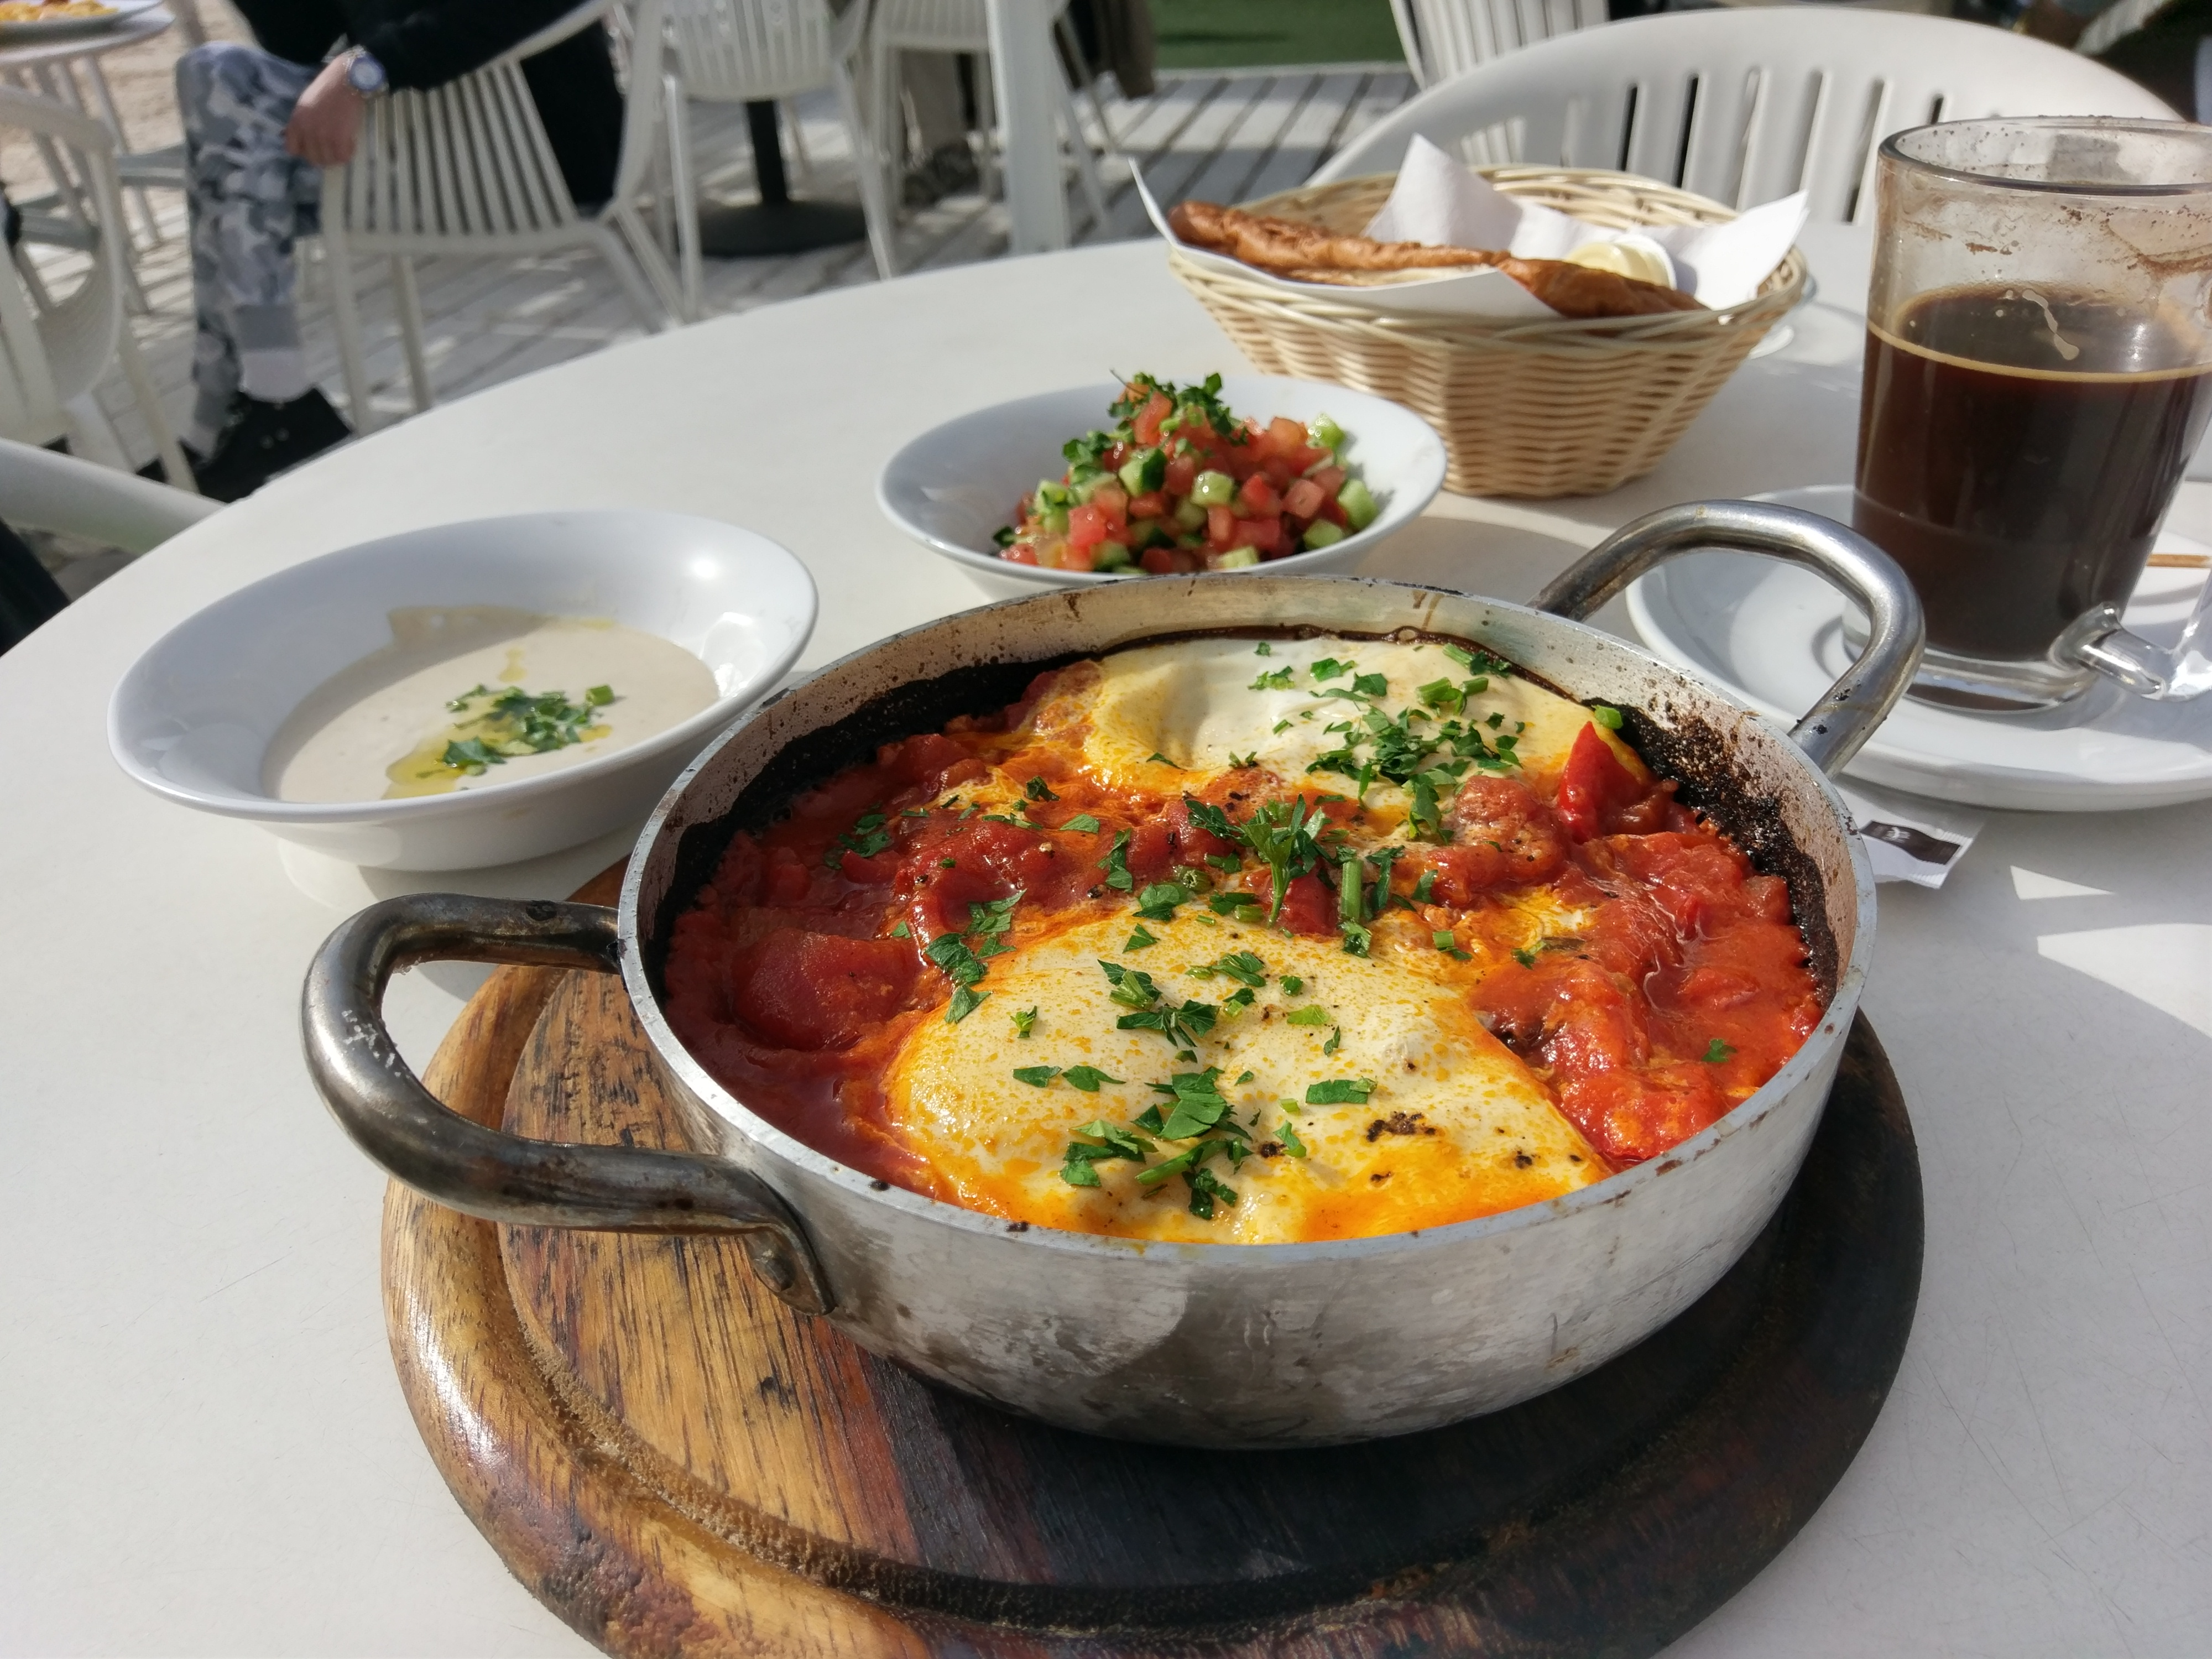 Typical Israeli Shakshuka breakfast dish - Hilton Beach area in Tel Aviv, Israel